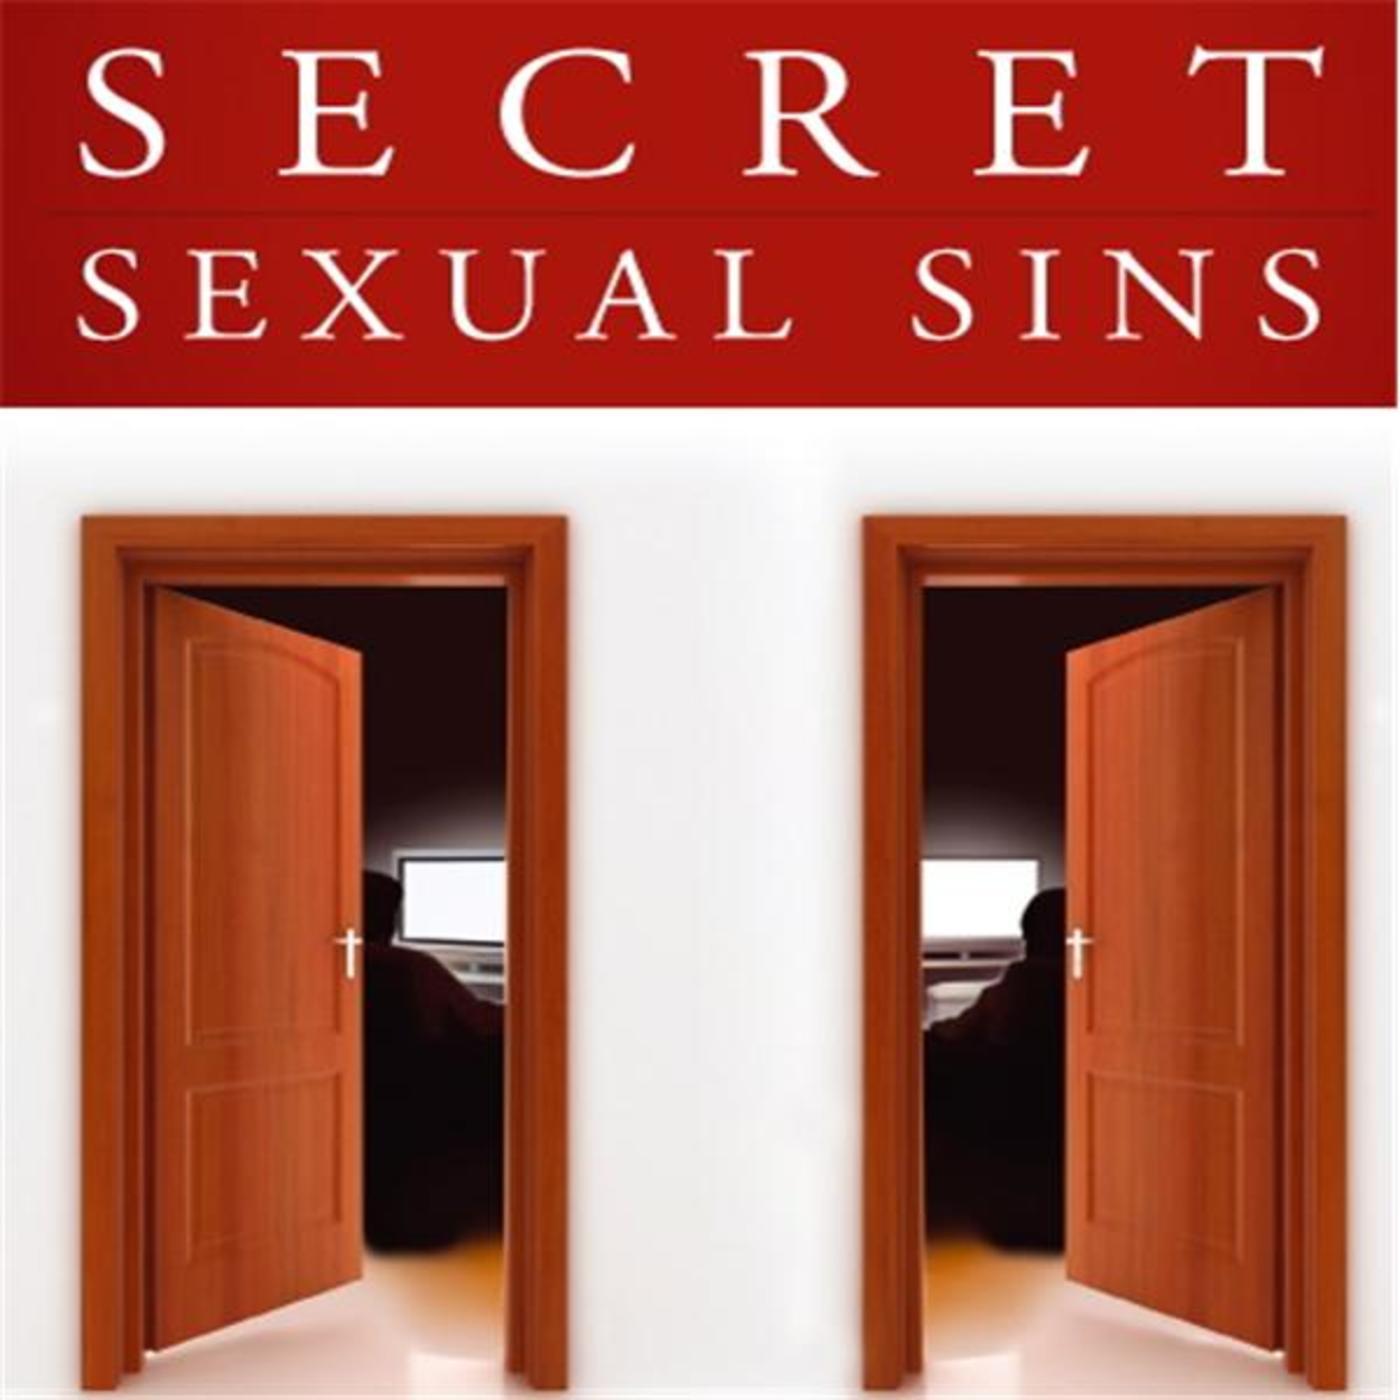 Secret Sexual Sins